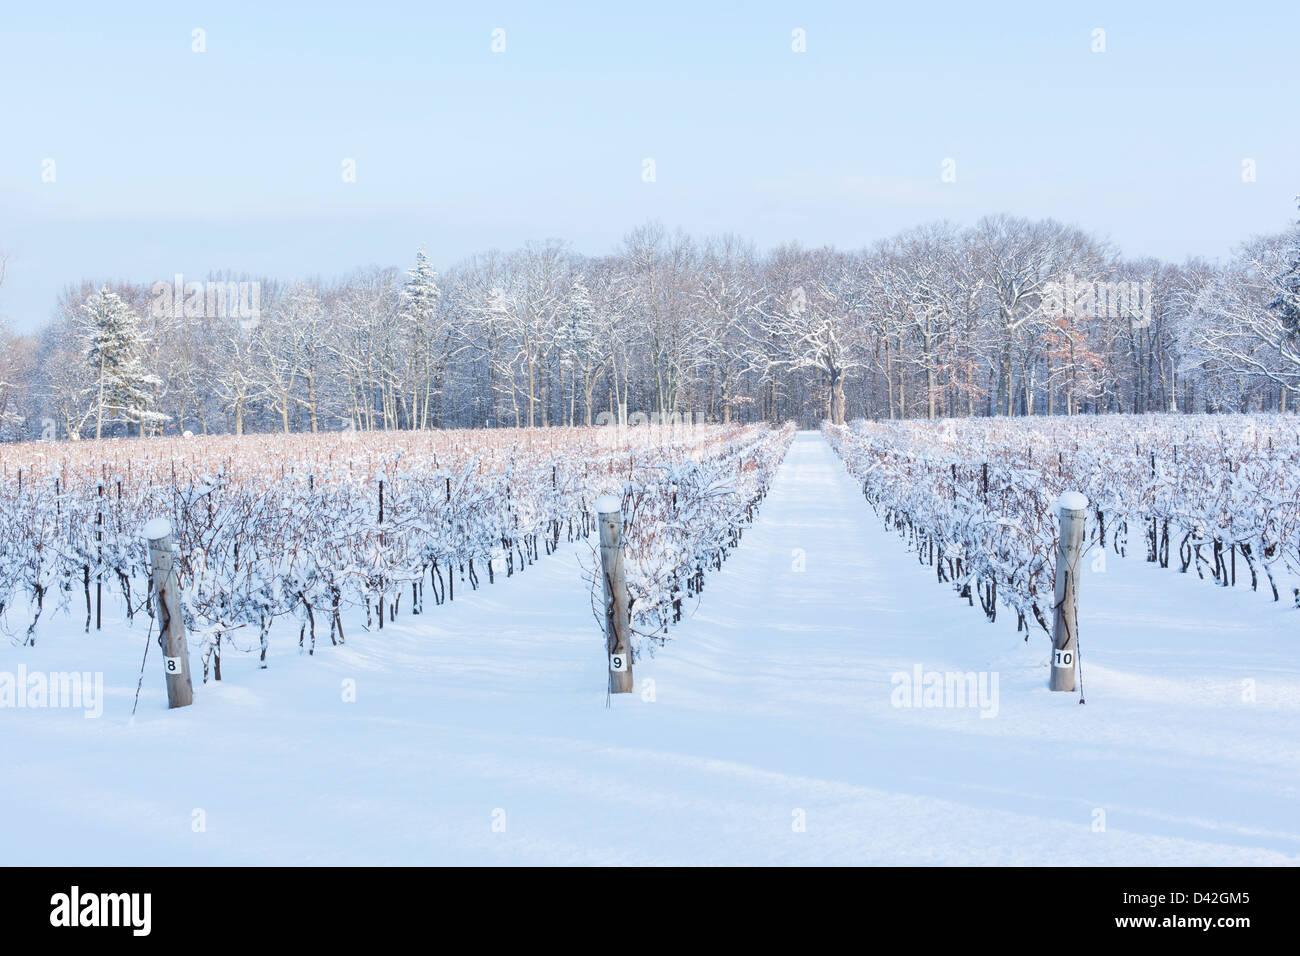 Canada,Ontario,Niagara-on-the-Lake, grape vineyard in winter - Stock Image